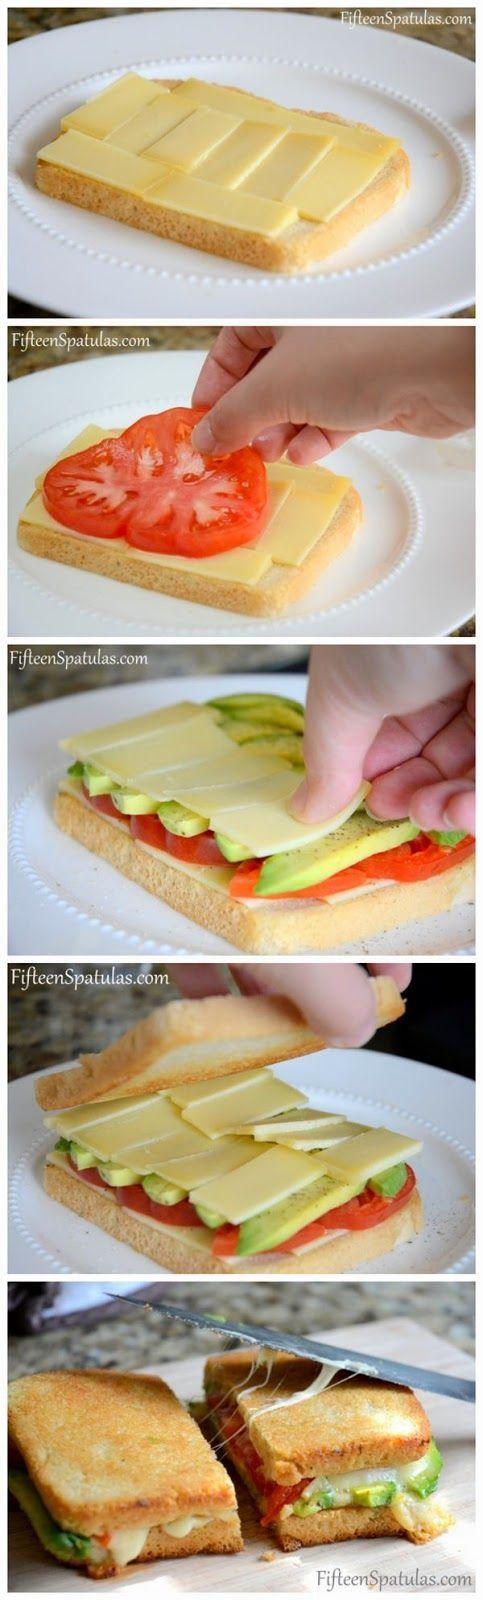 Sandwich de tomate, aguacate y queso